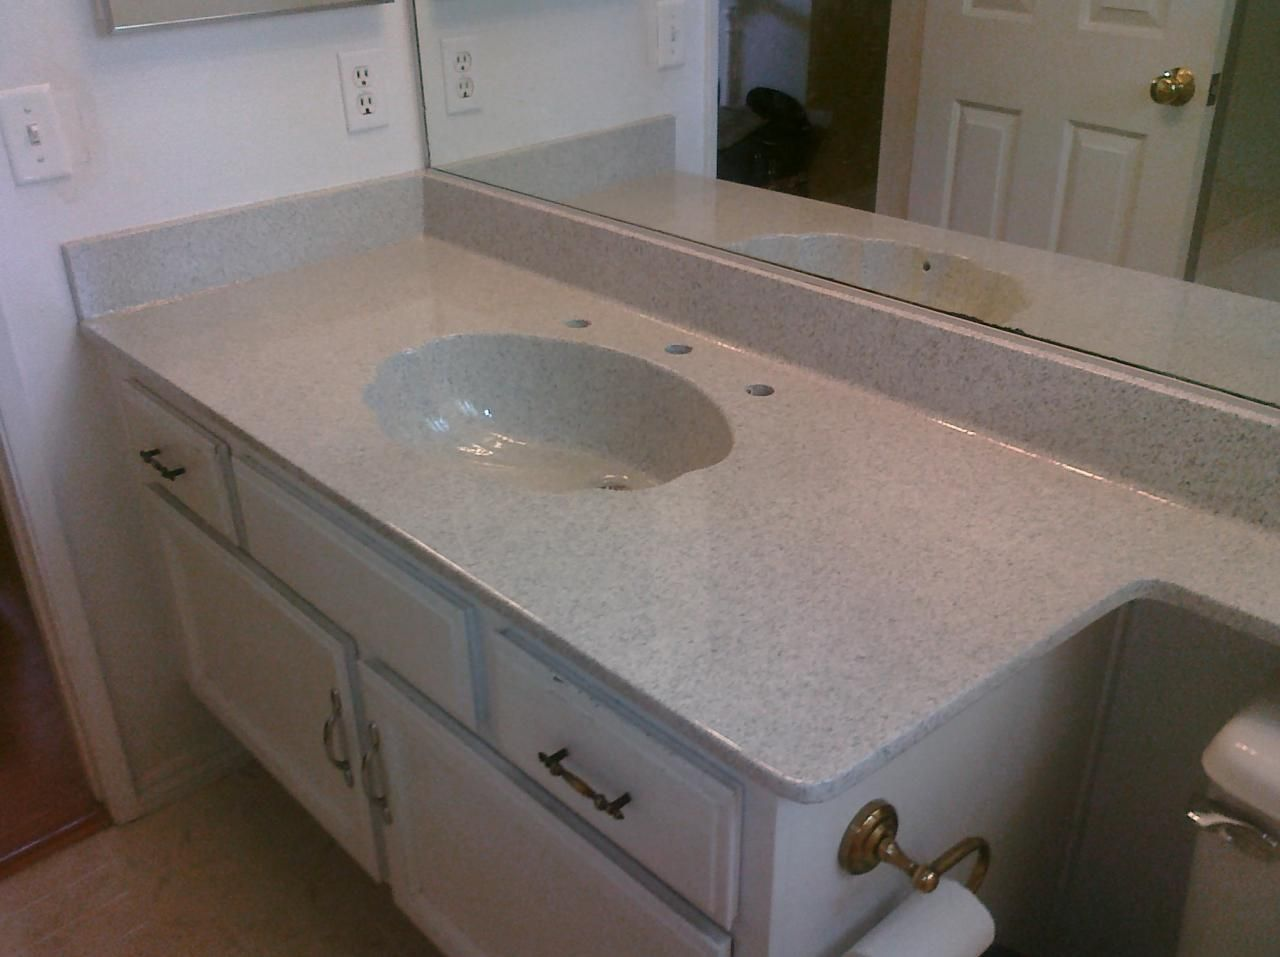 Pkb Reglazing Cultured Marble Countertop Sink Combo Reglazed